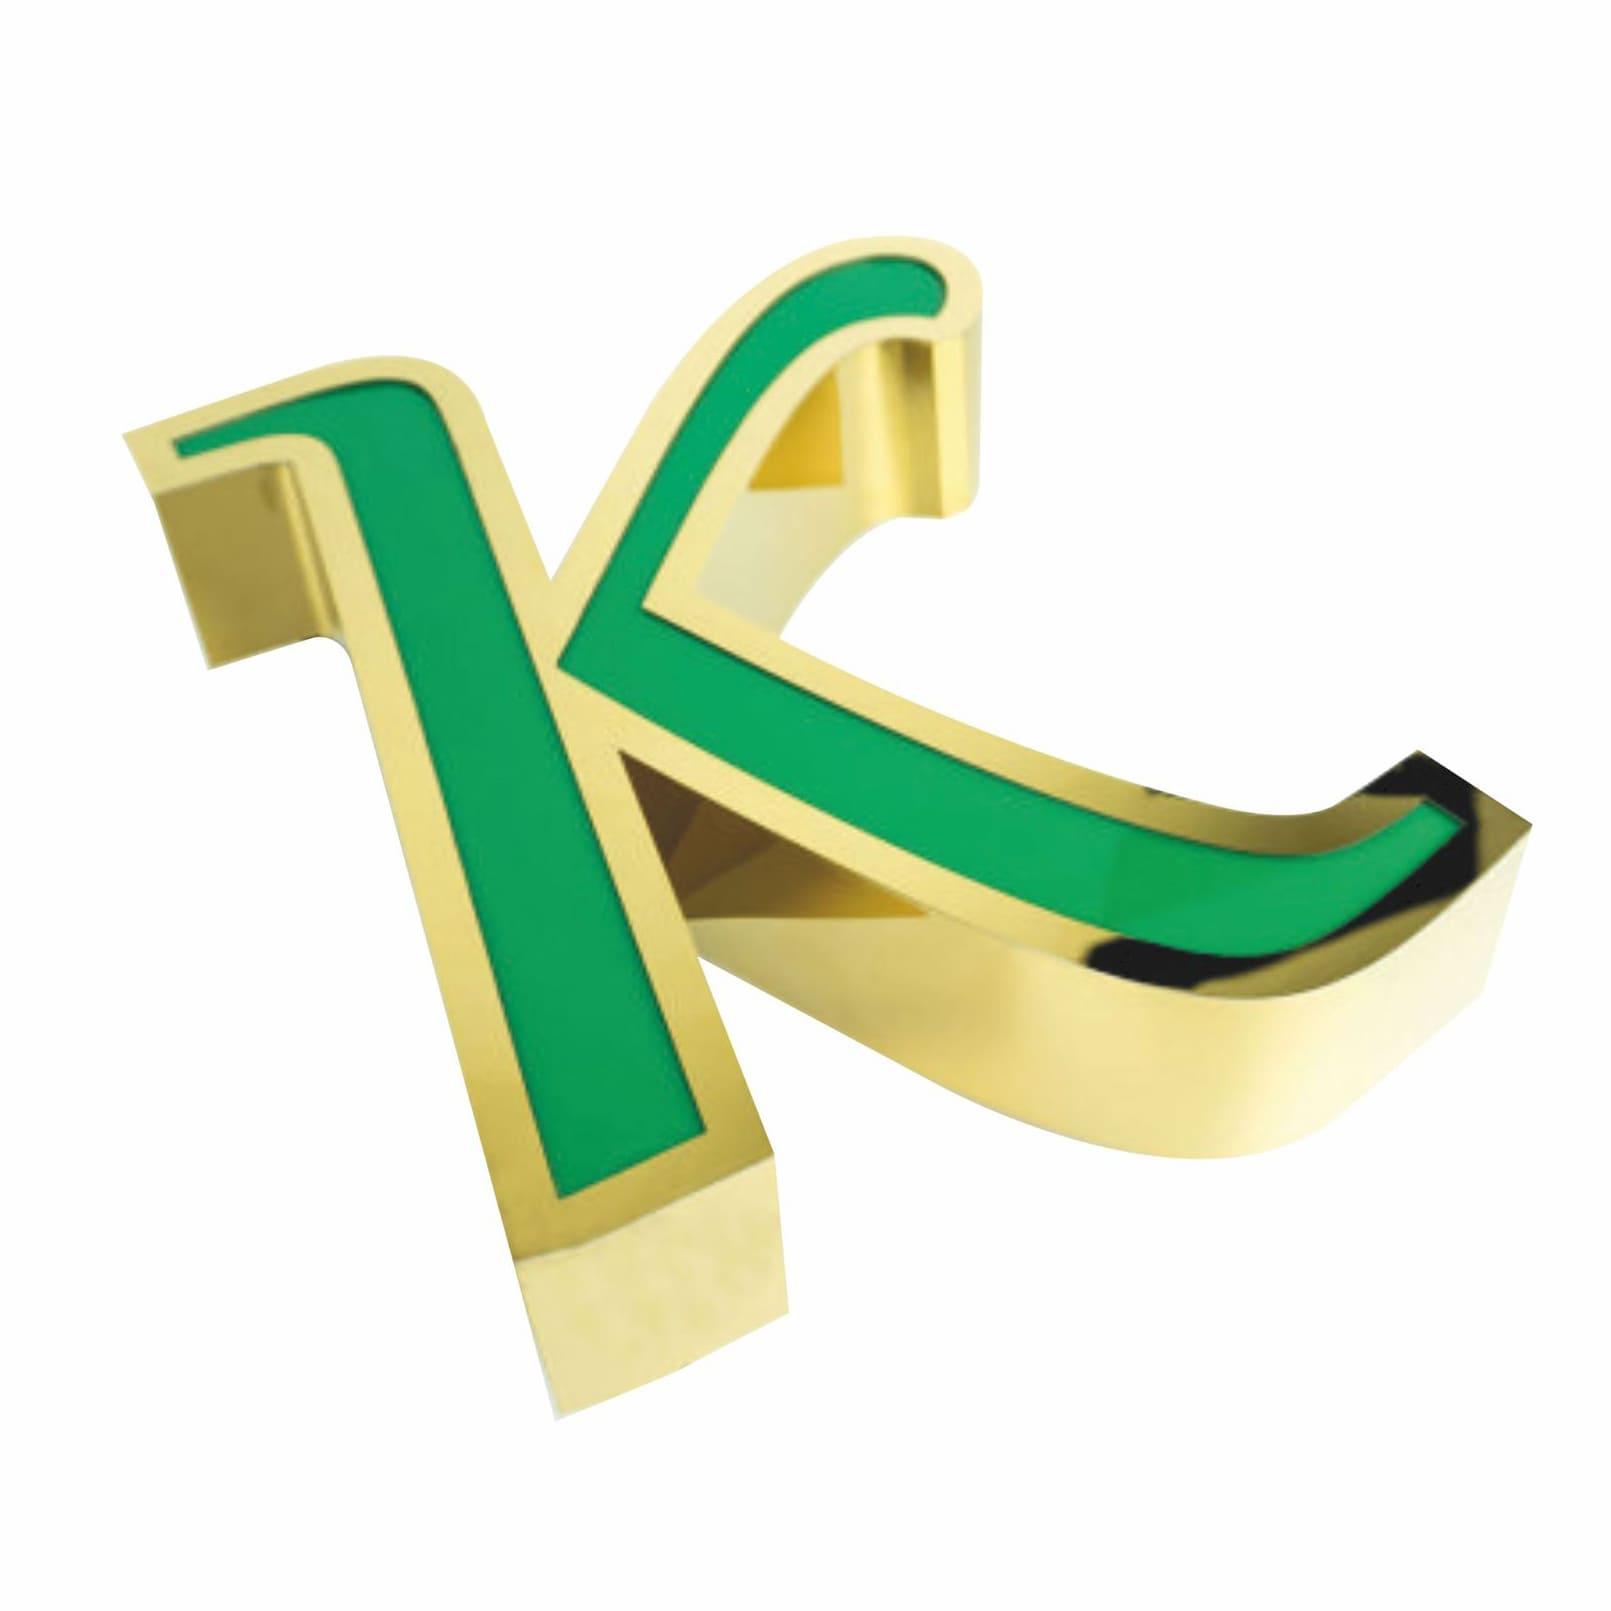 Gold Fileli Kutu harf